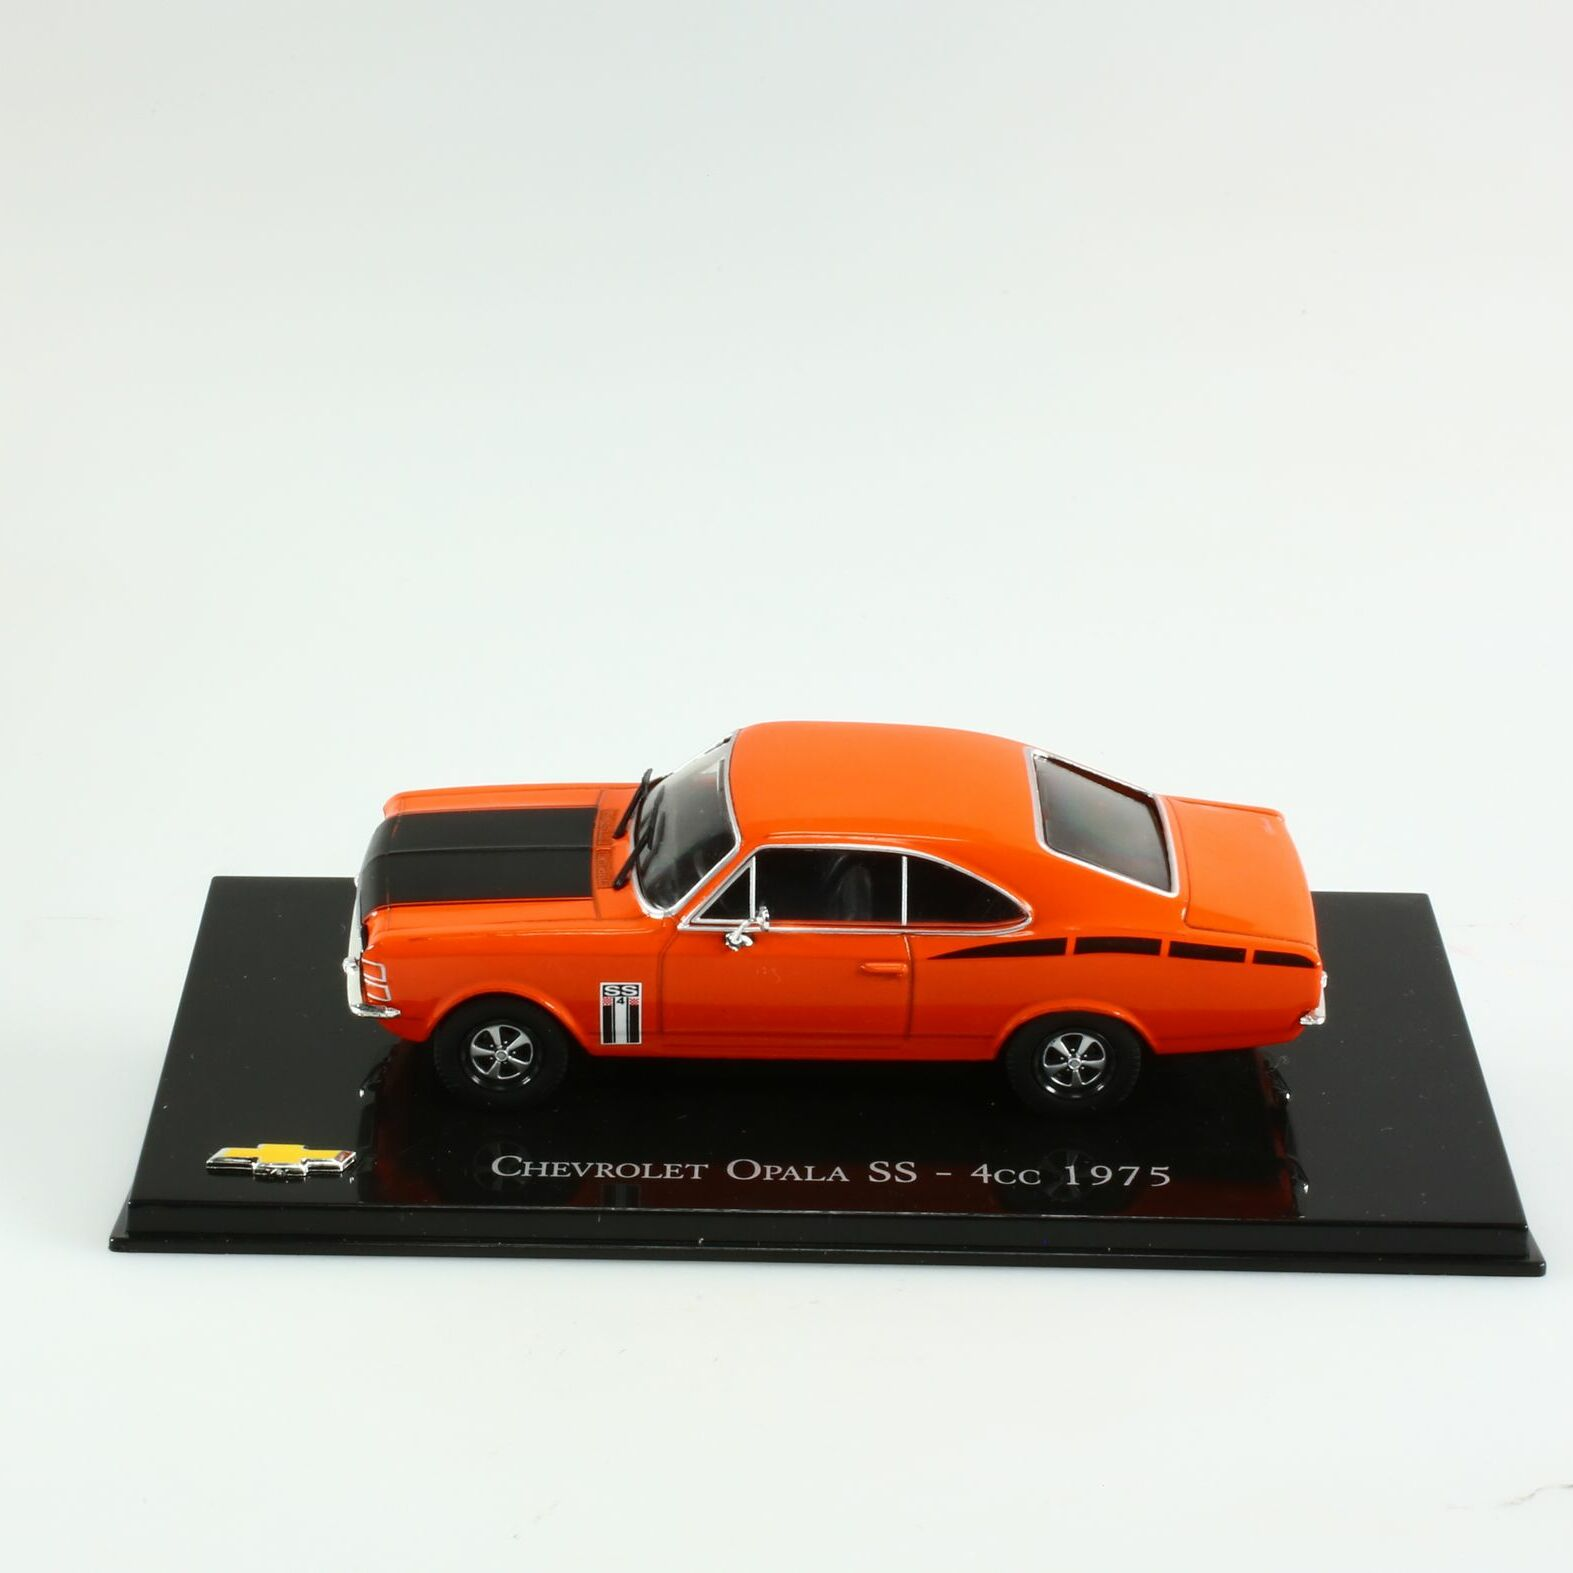 Chevrolet Opala SS-4cc - 1975, 1/43